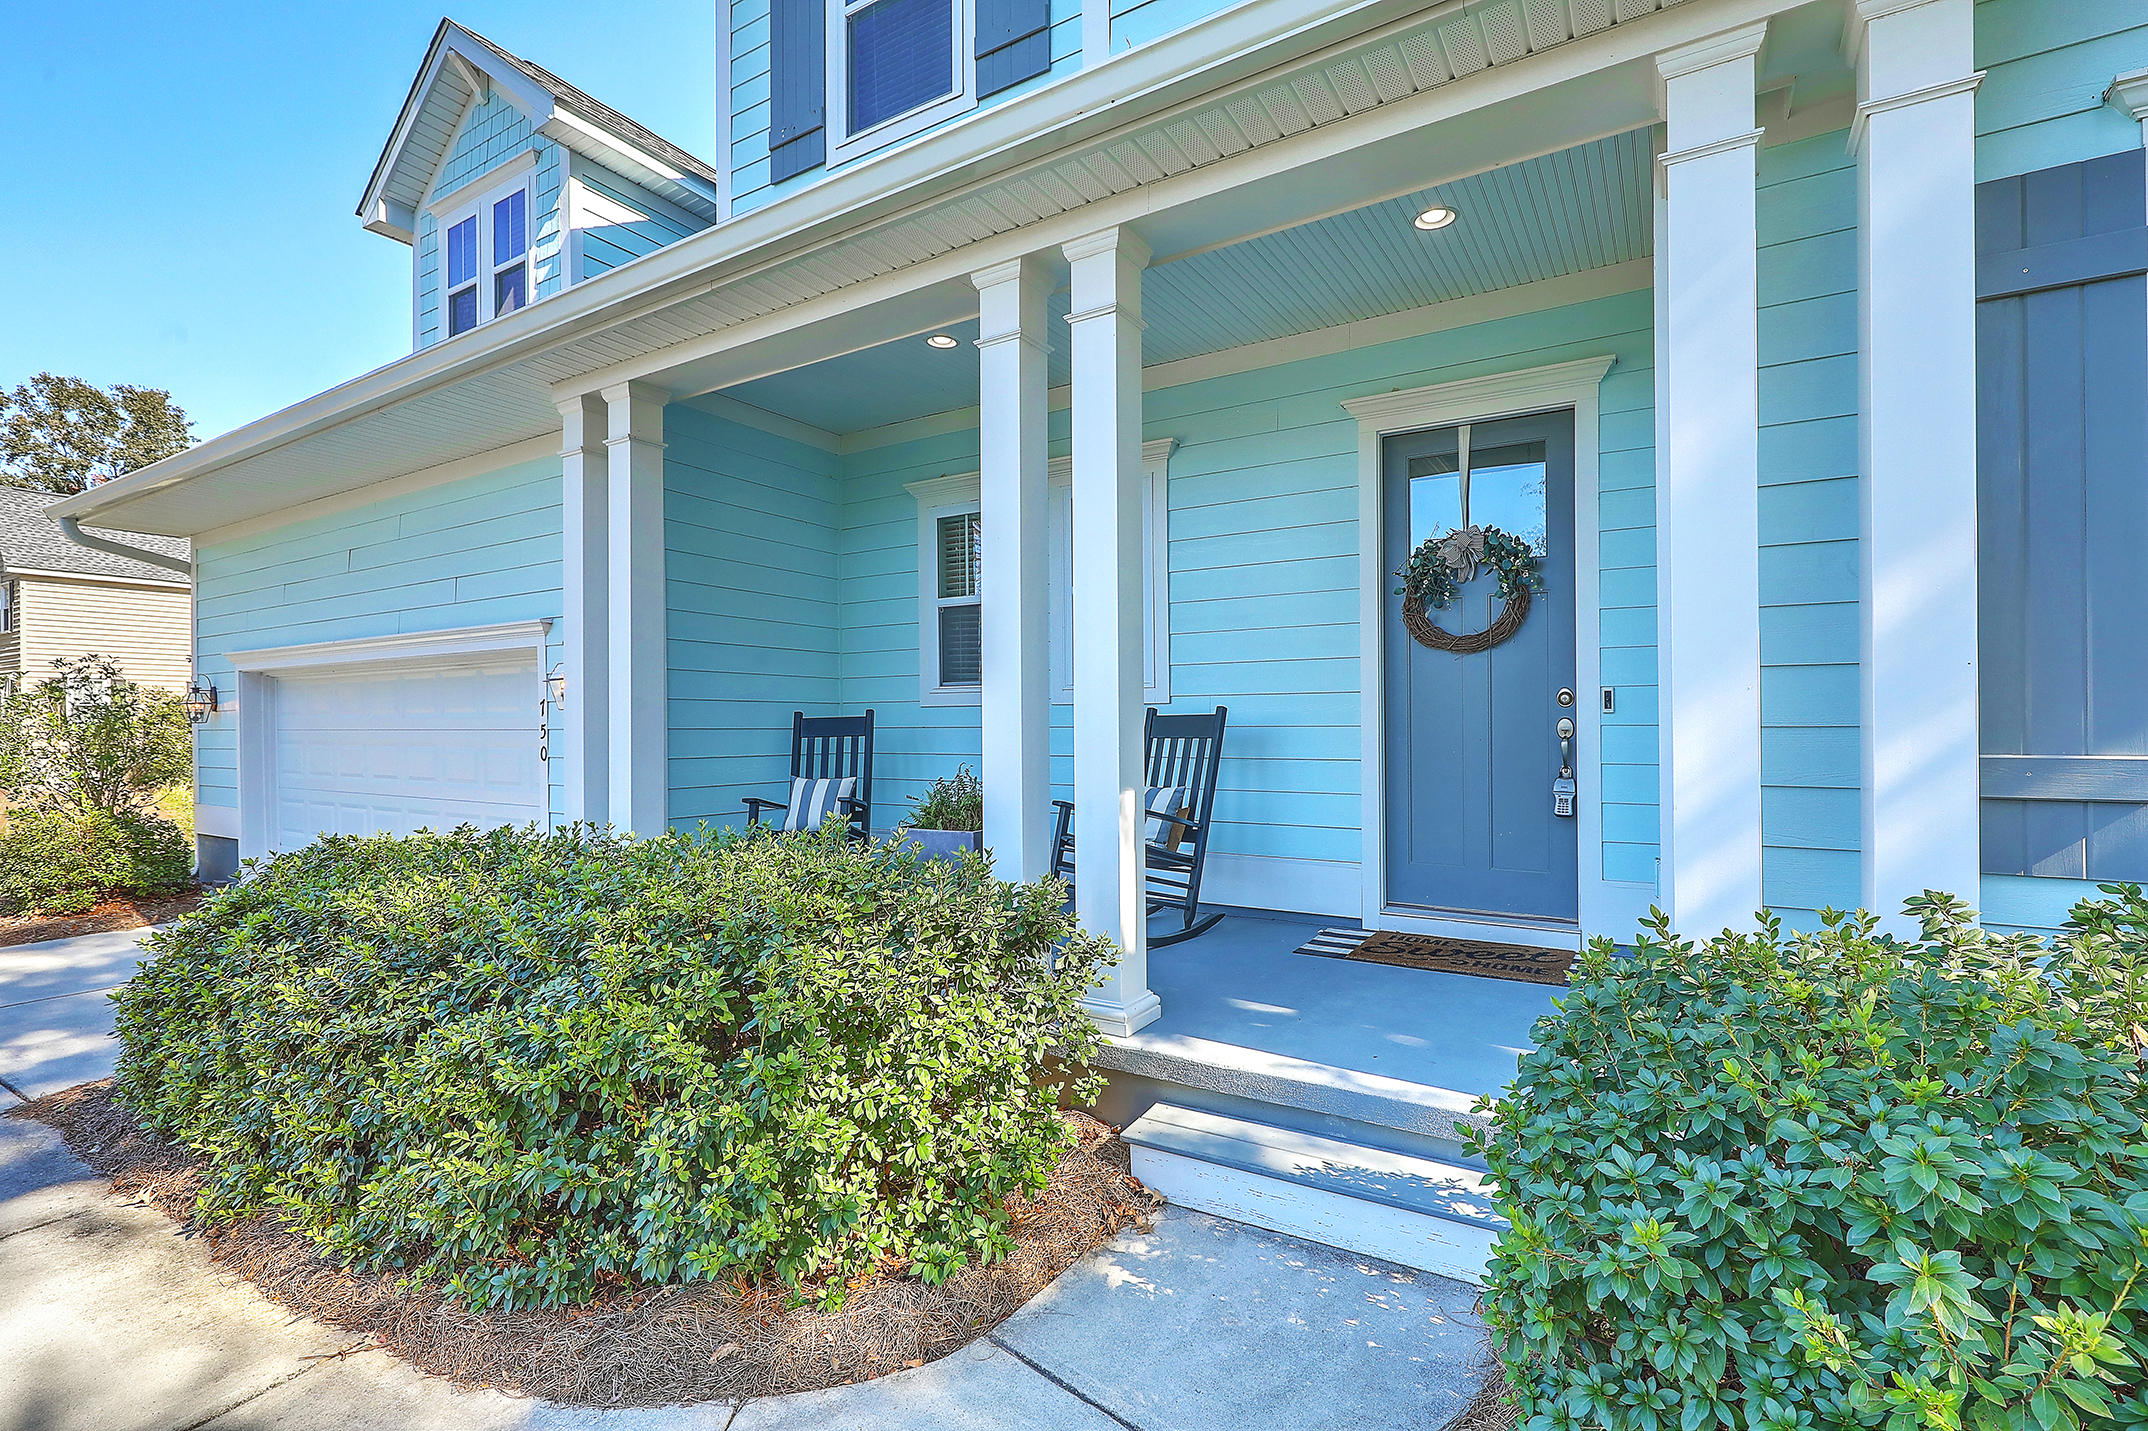 Stiles Point Plantation Homes For Sale - 750 Old Plantation, Charleston, SC - 19